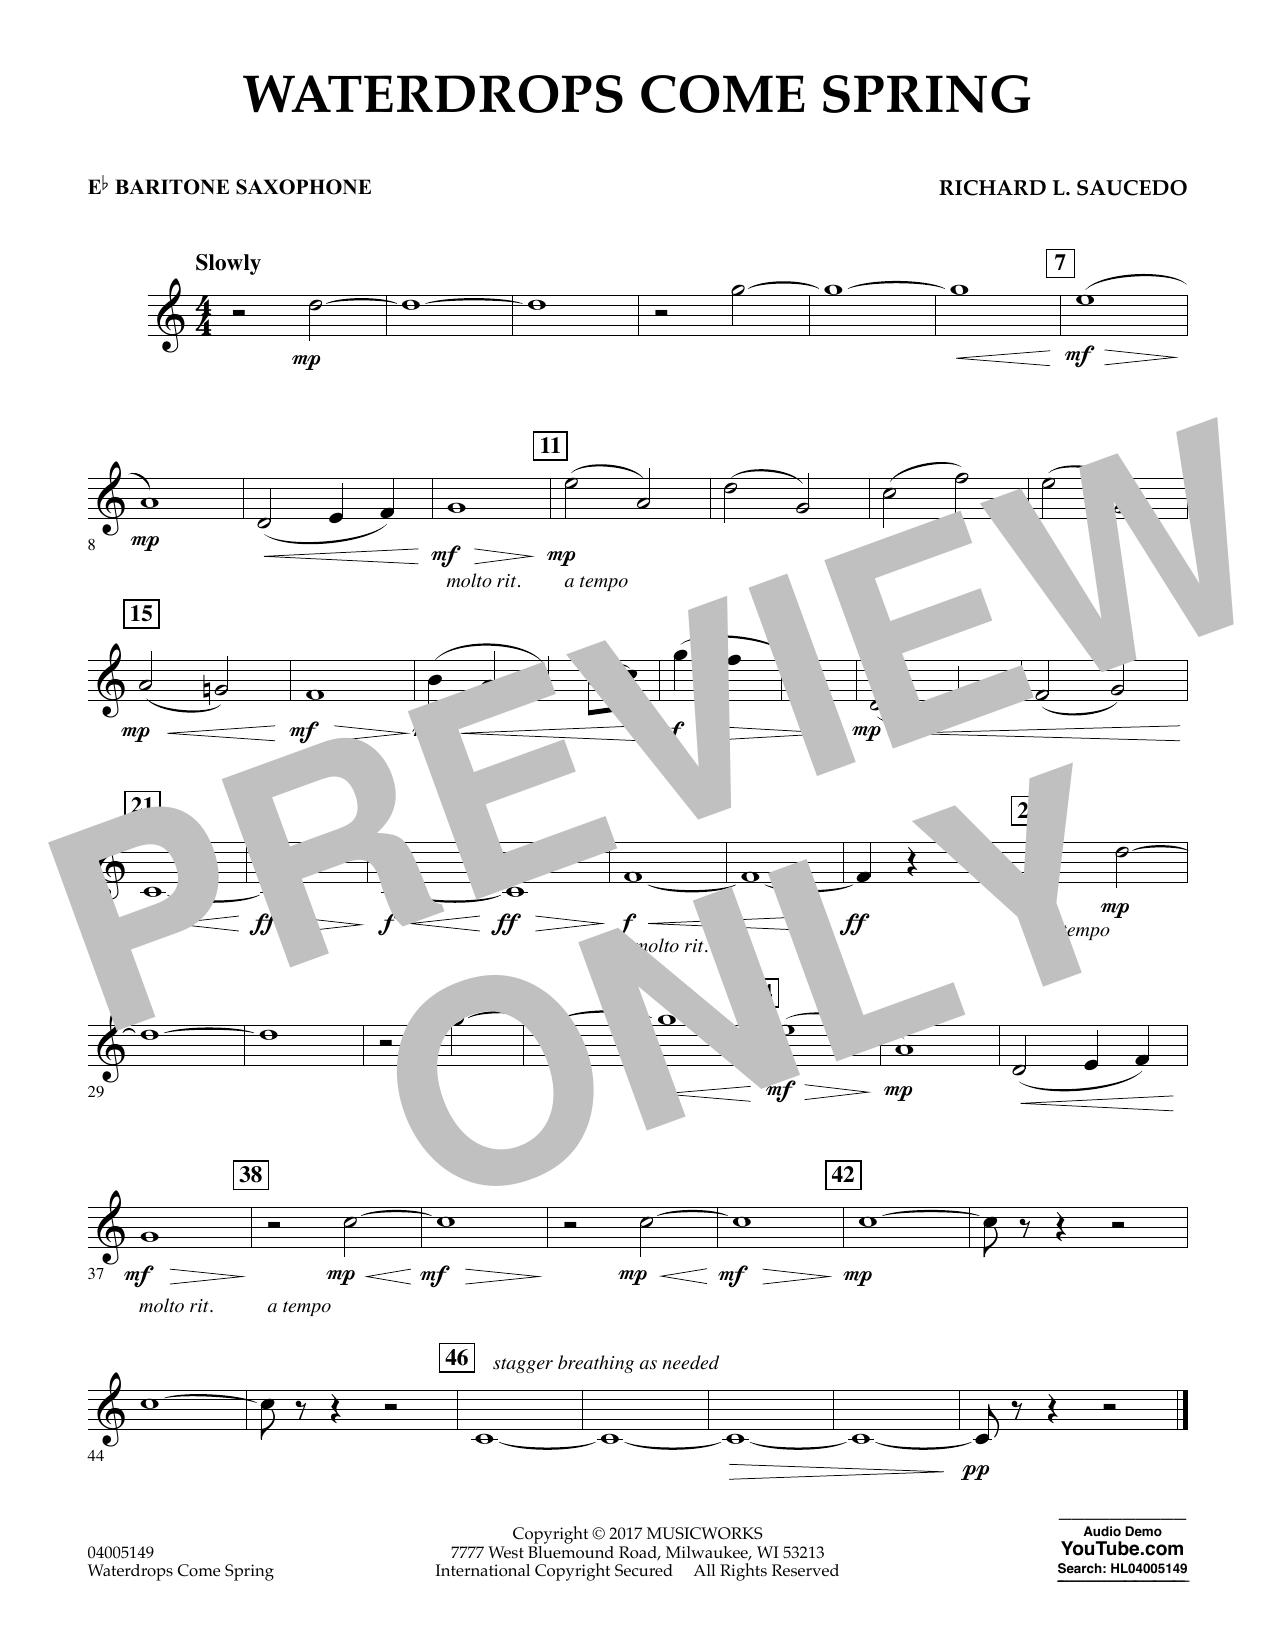 Richard L. Saucedo Waterdrops Come Spring - Eb Baritone Saxophone sheet music notes and chords. Download Printable PDF.